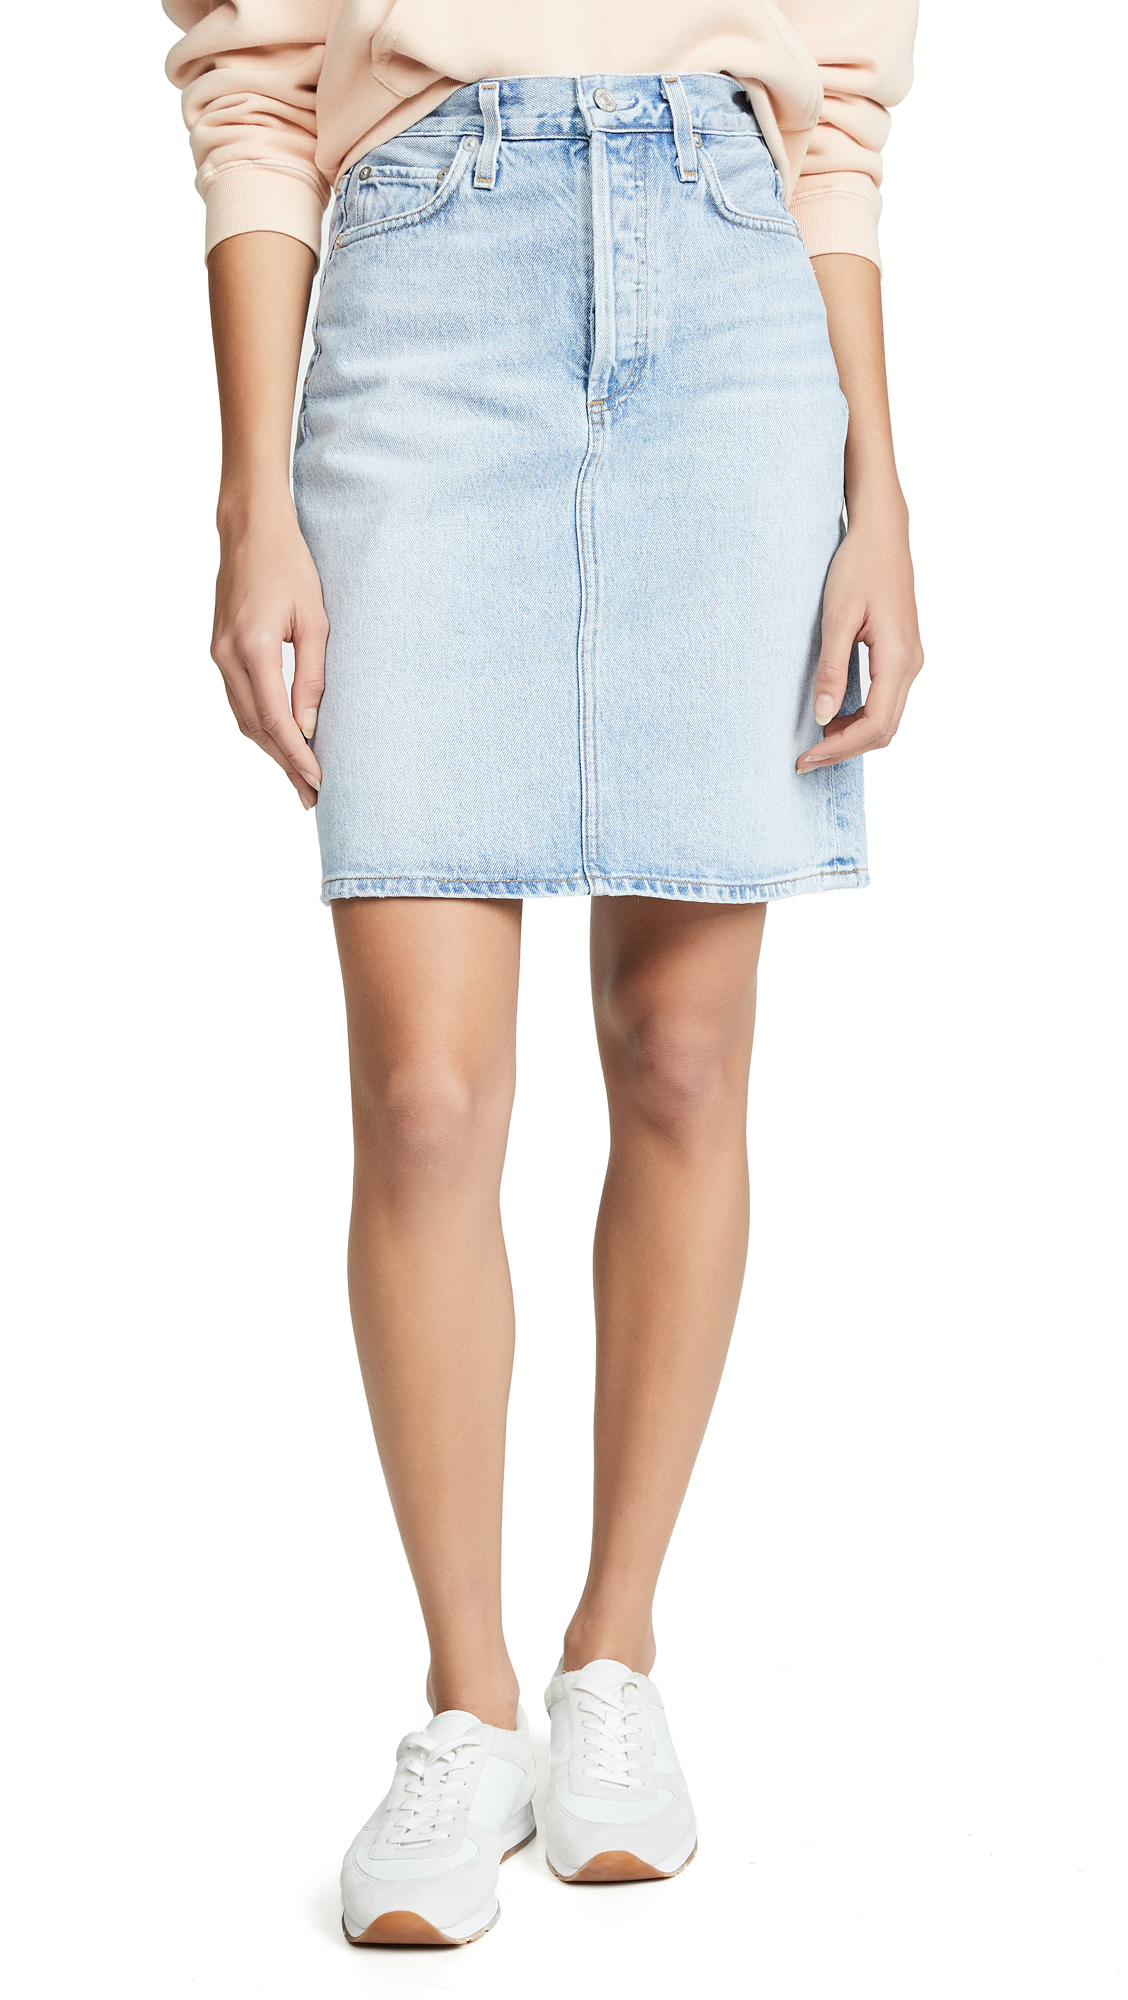 AGOLDE High Rise Iris Skirt - Prankster